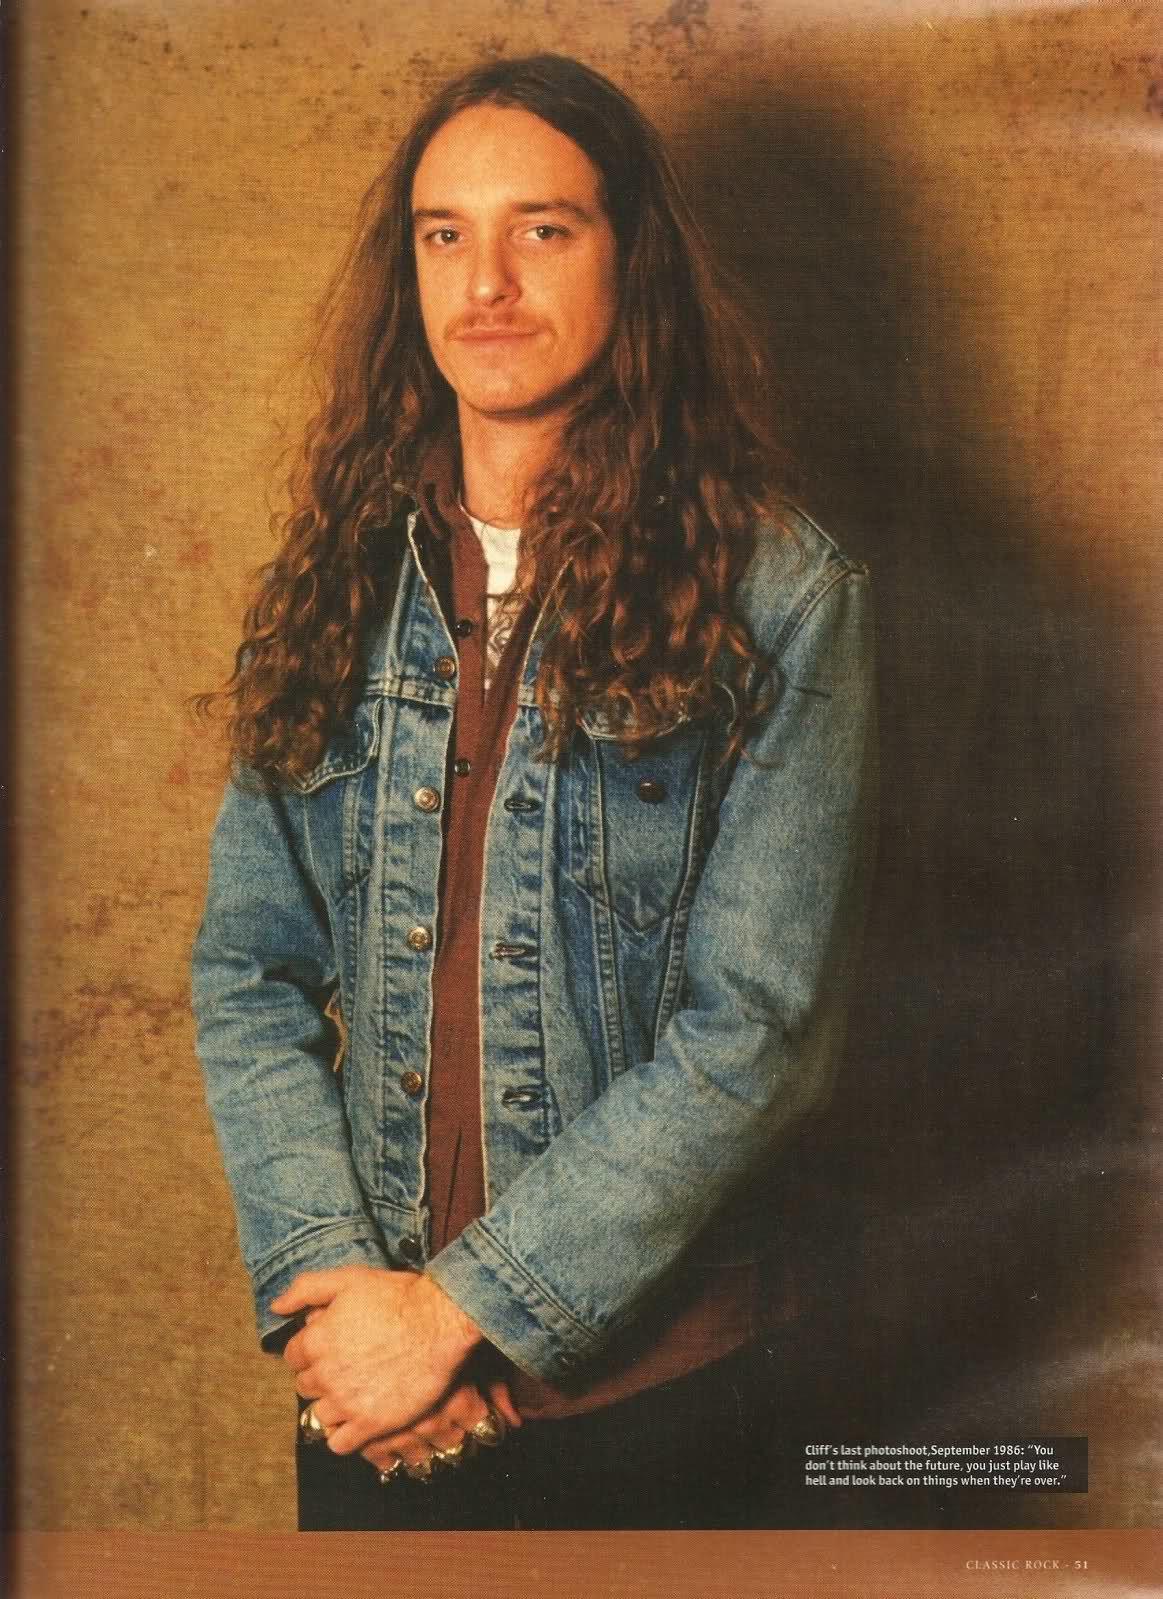 Cliff Burton - Metallica - last photoshoot, September 1986